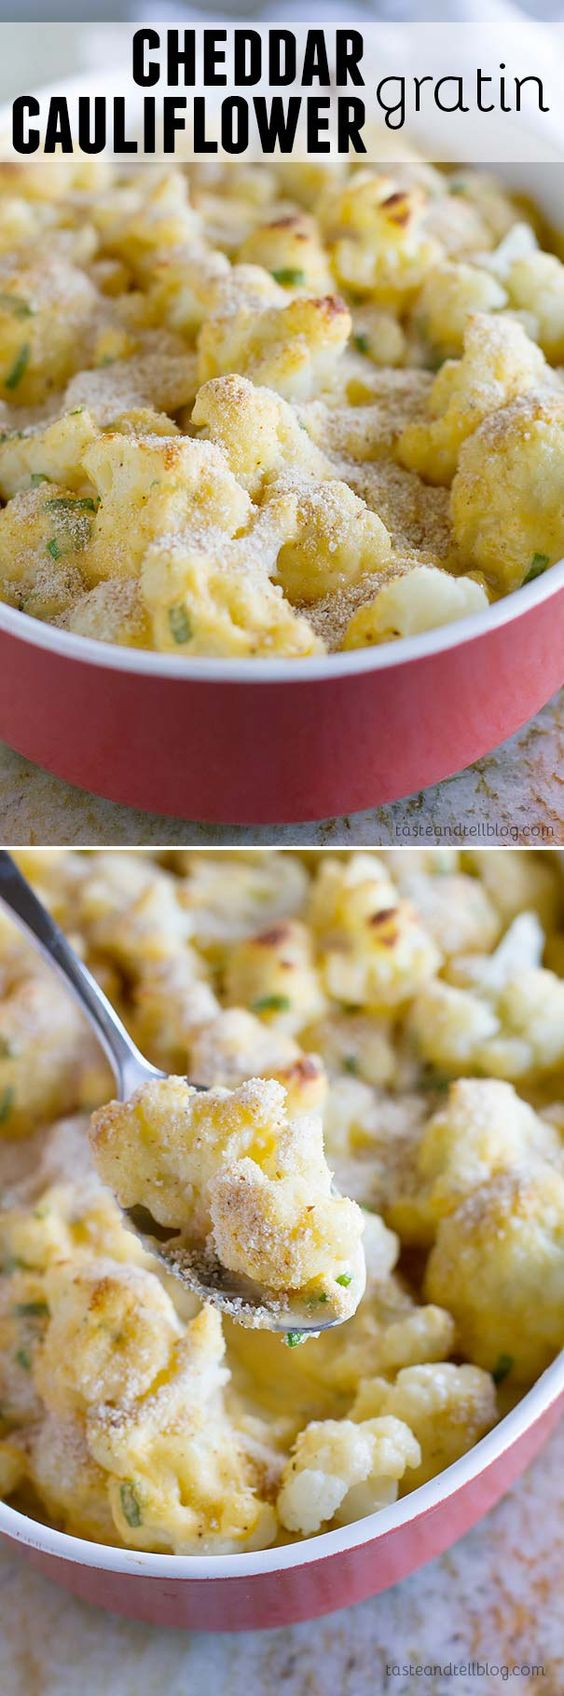 Cauliflower gratin, Creamy cheese and Gratin on Pinterest